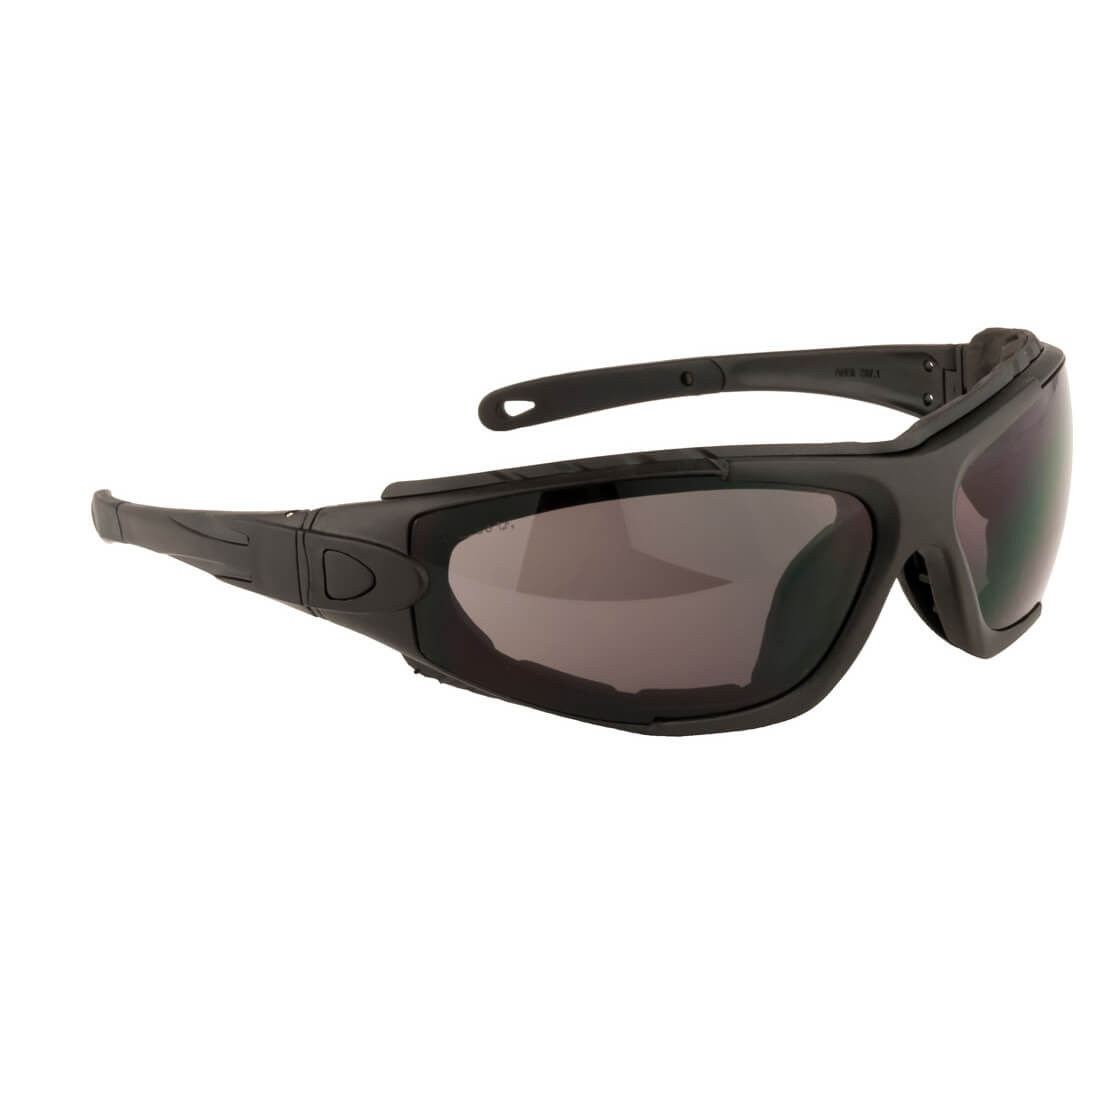 Ochelari Levo - Echipamente de protectie personala